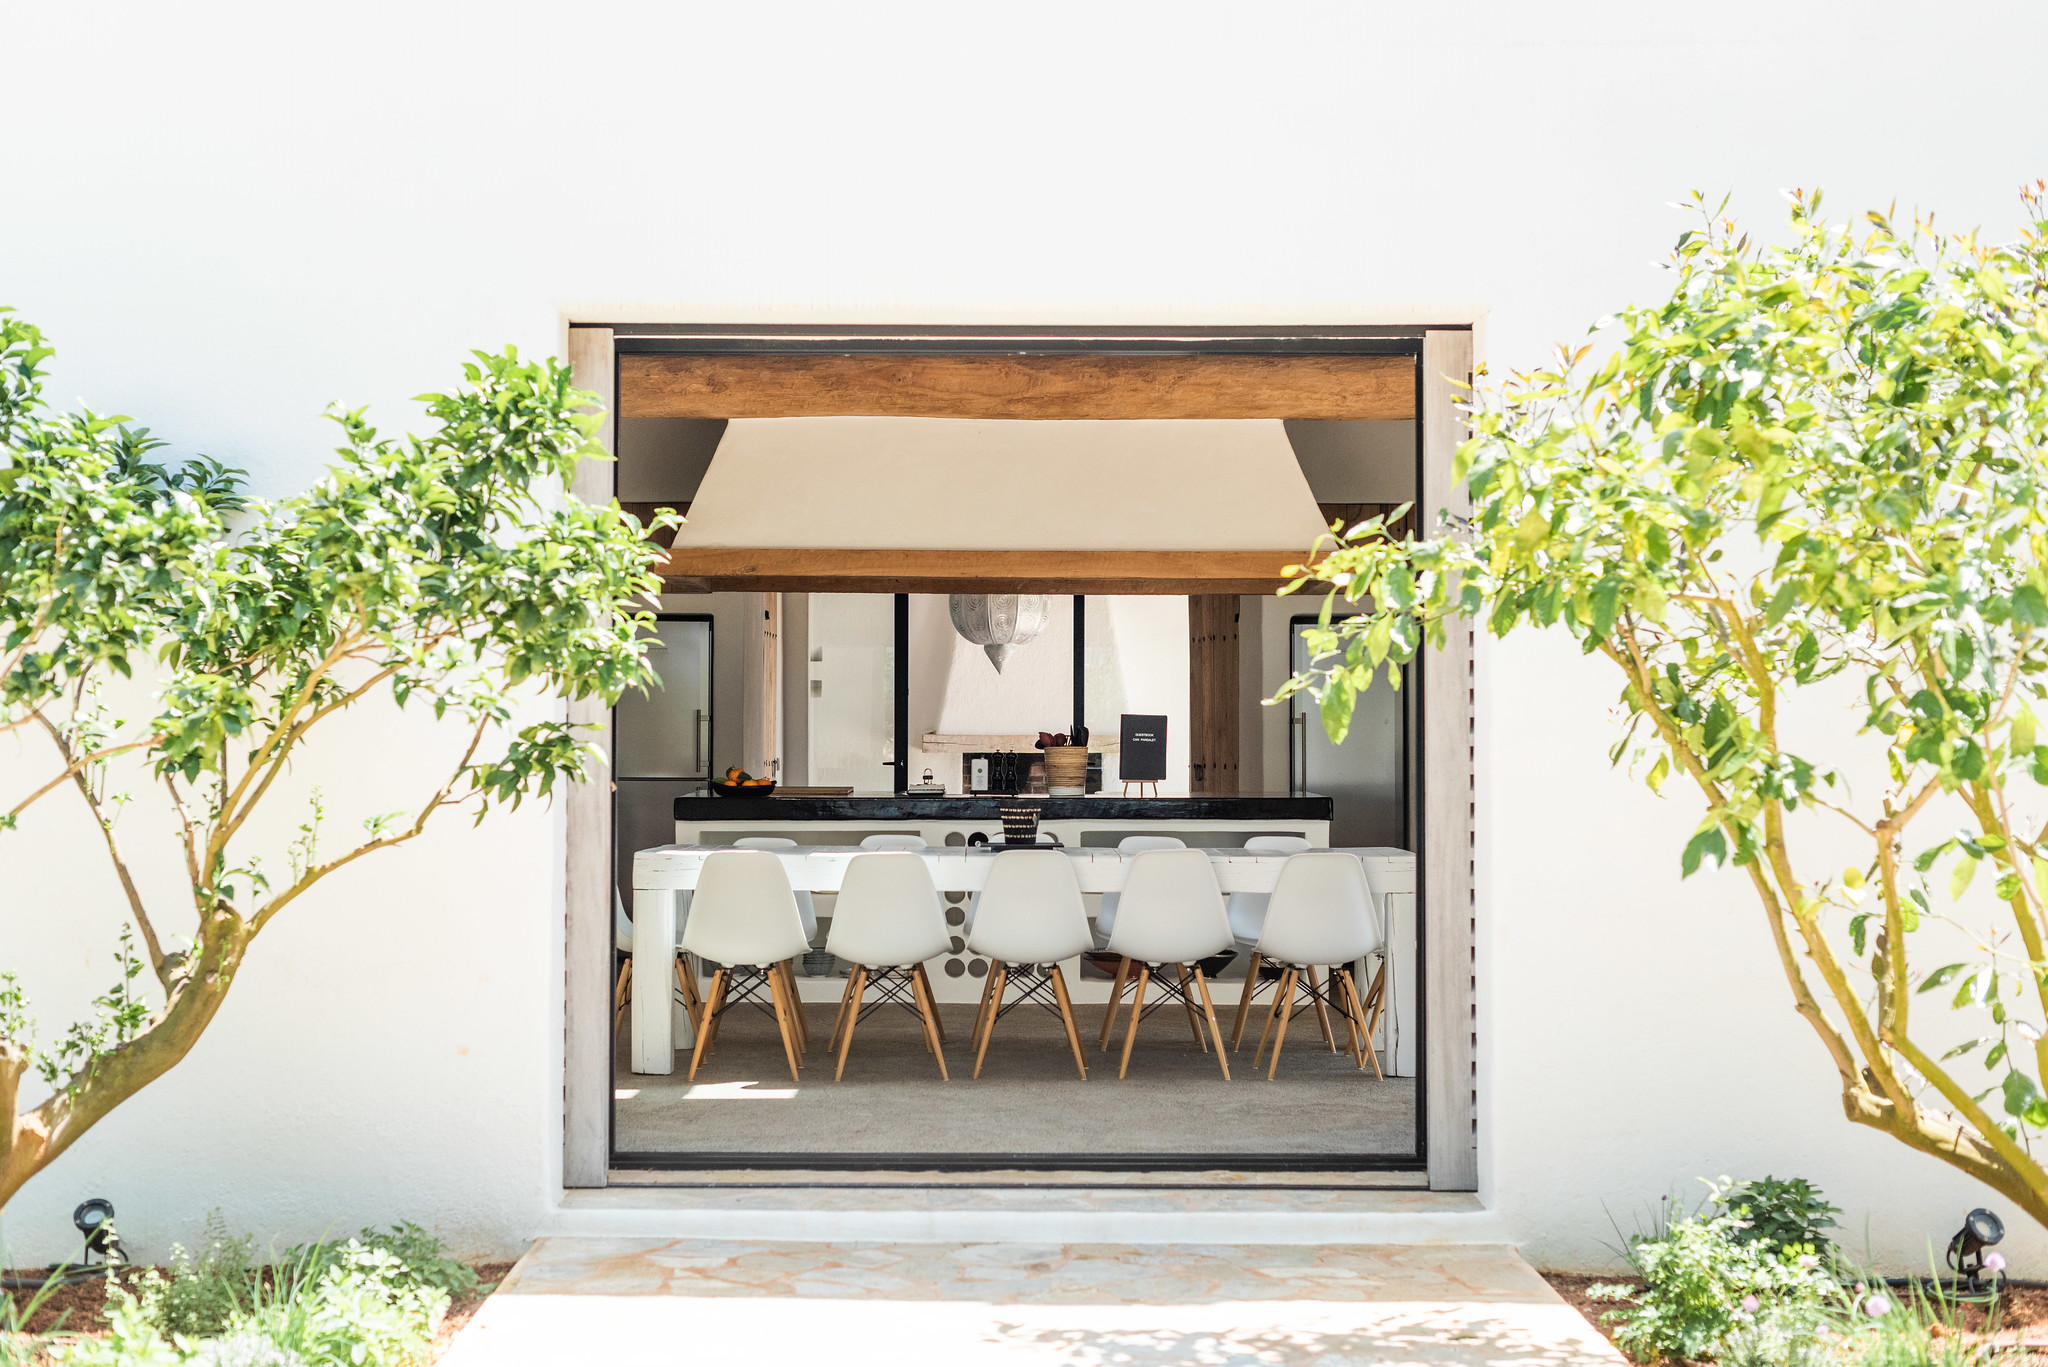 https://www.white-ibiza.com/wp-content/uploads/2020/05/white-ibiza-villas-can-terra-view-inside.jpg